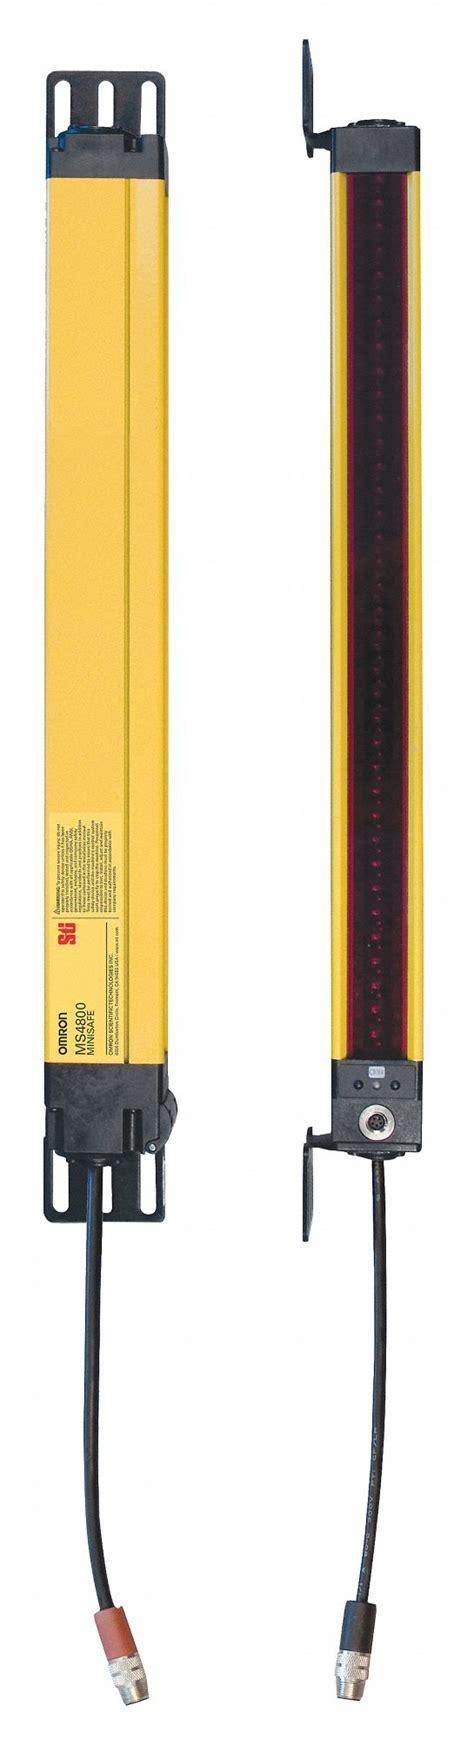 sti light curtain distributors omron sti light curtain protcted ht 17 3in 10n160 70230